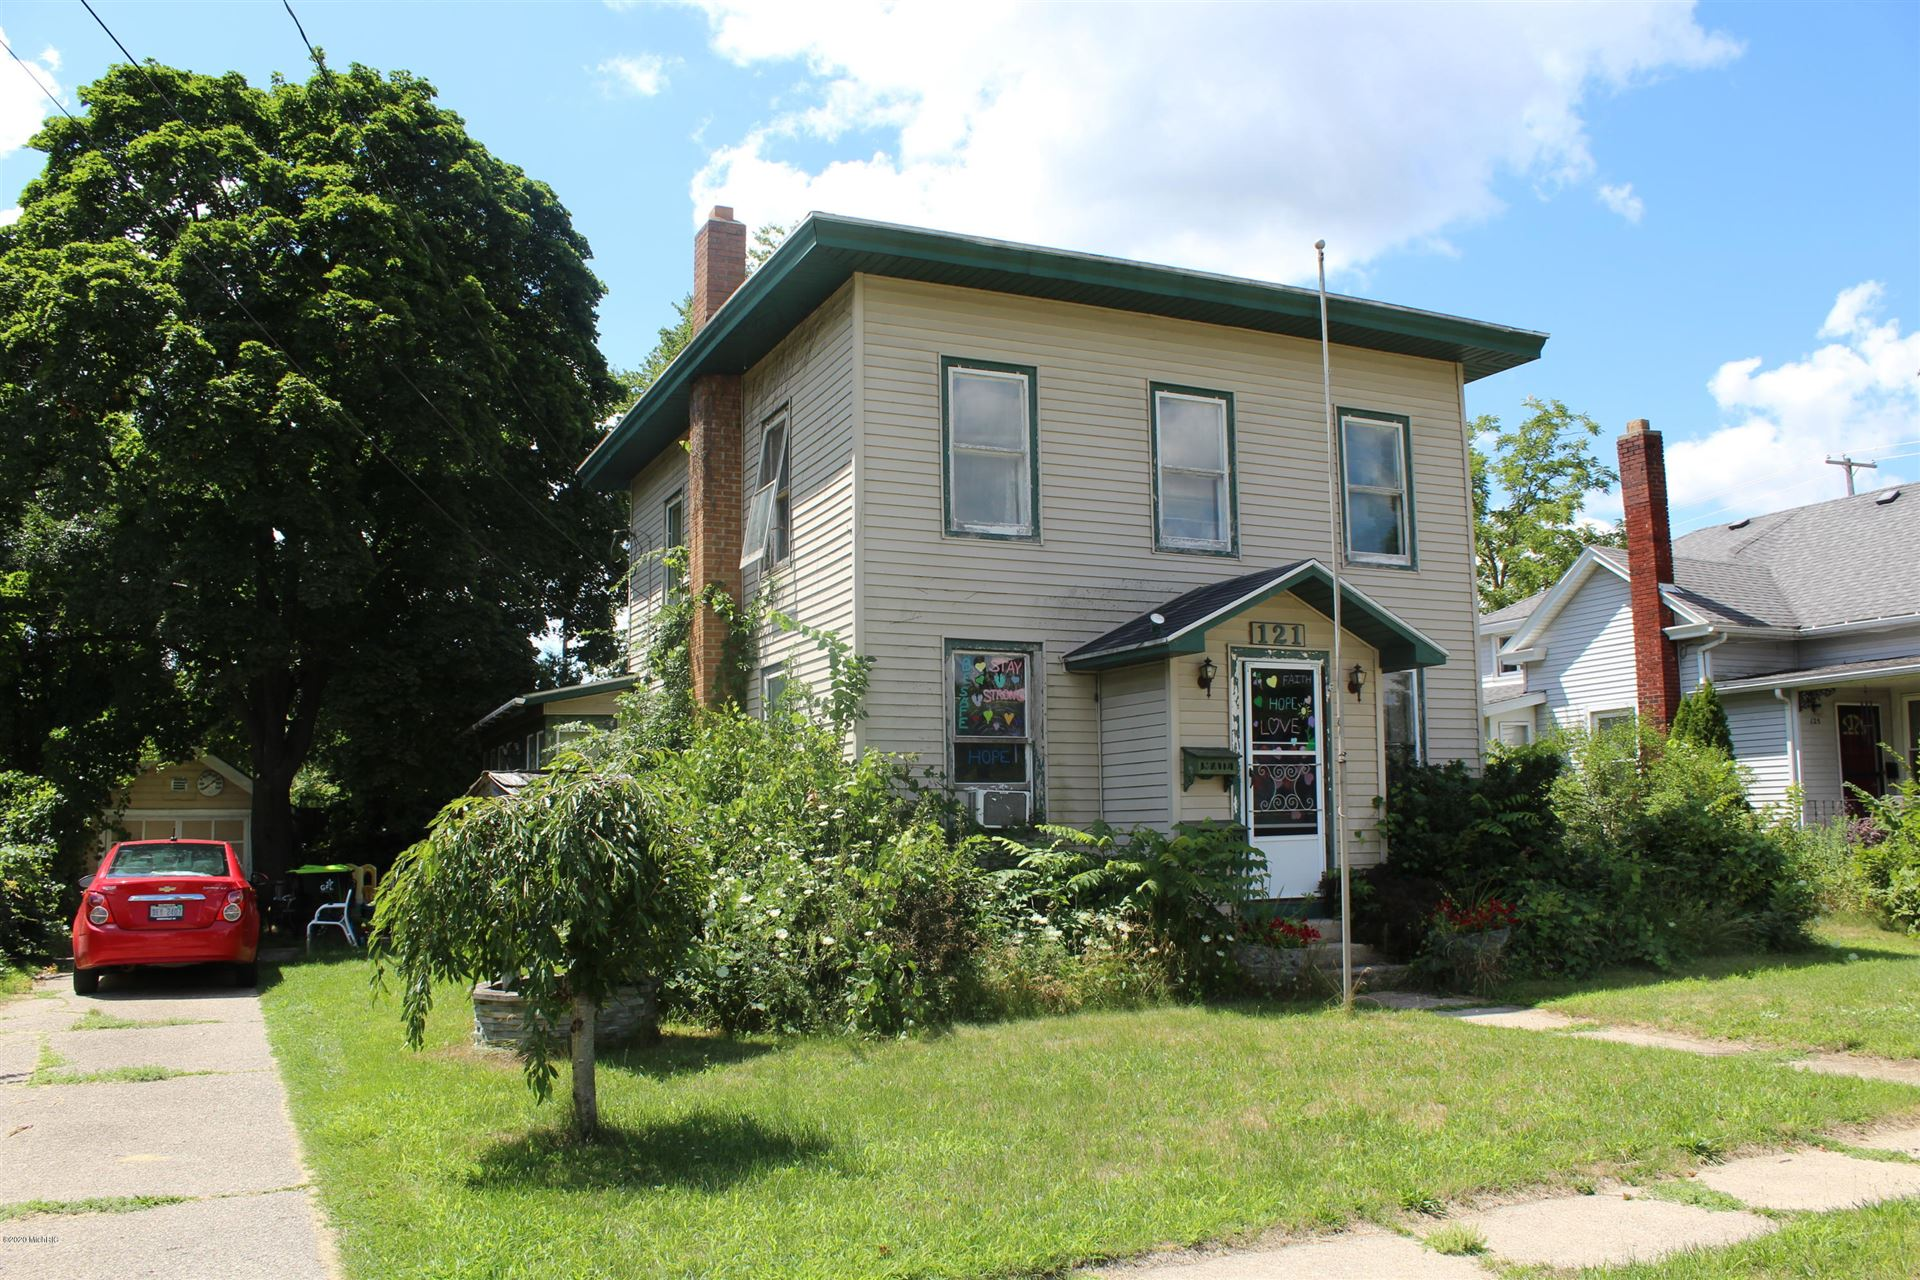 121 W Gibson Drive, Greenville, MI 48838 - MLS#: 20030882